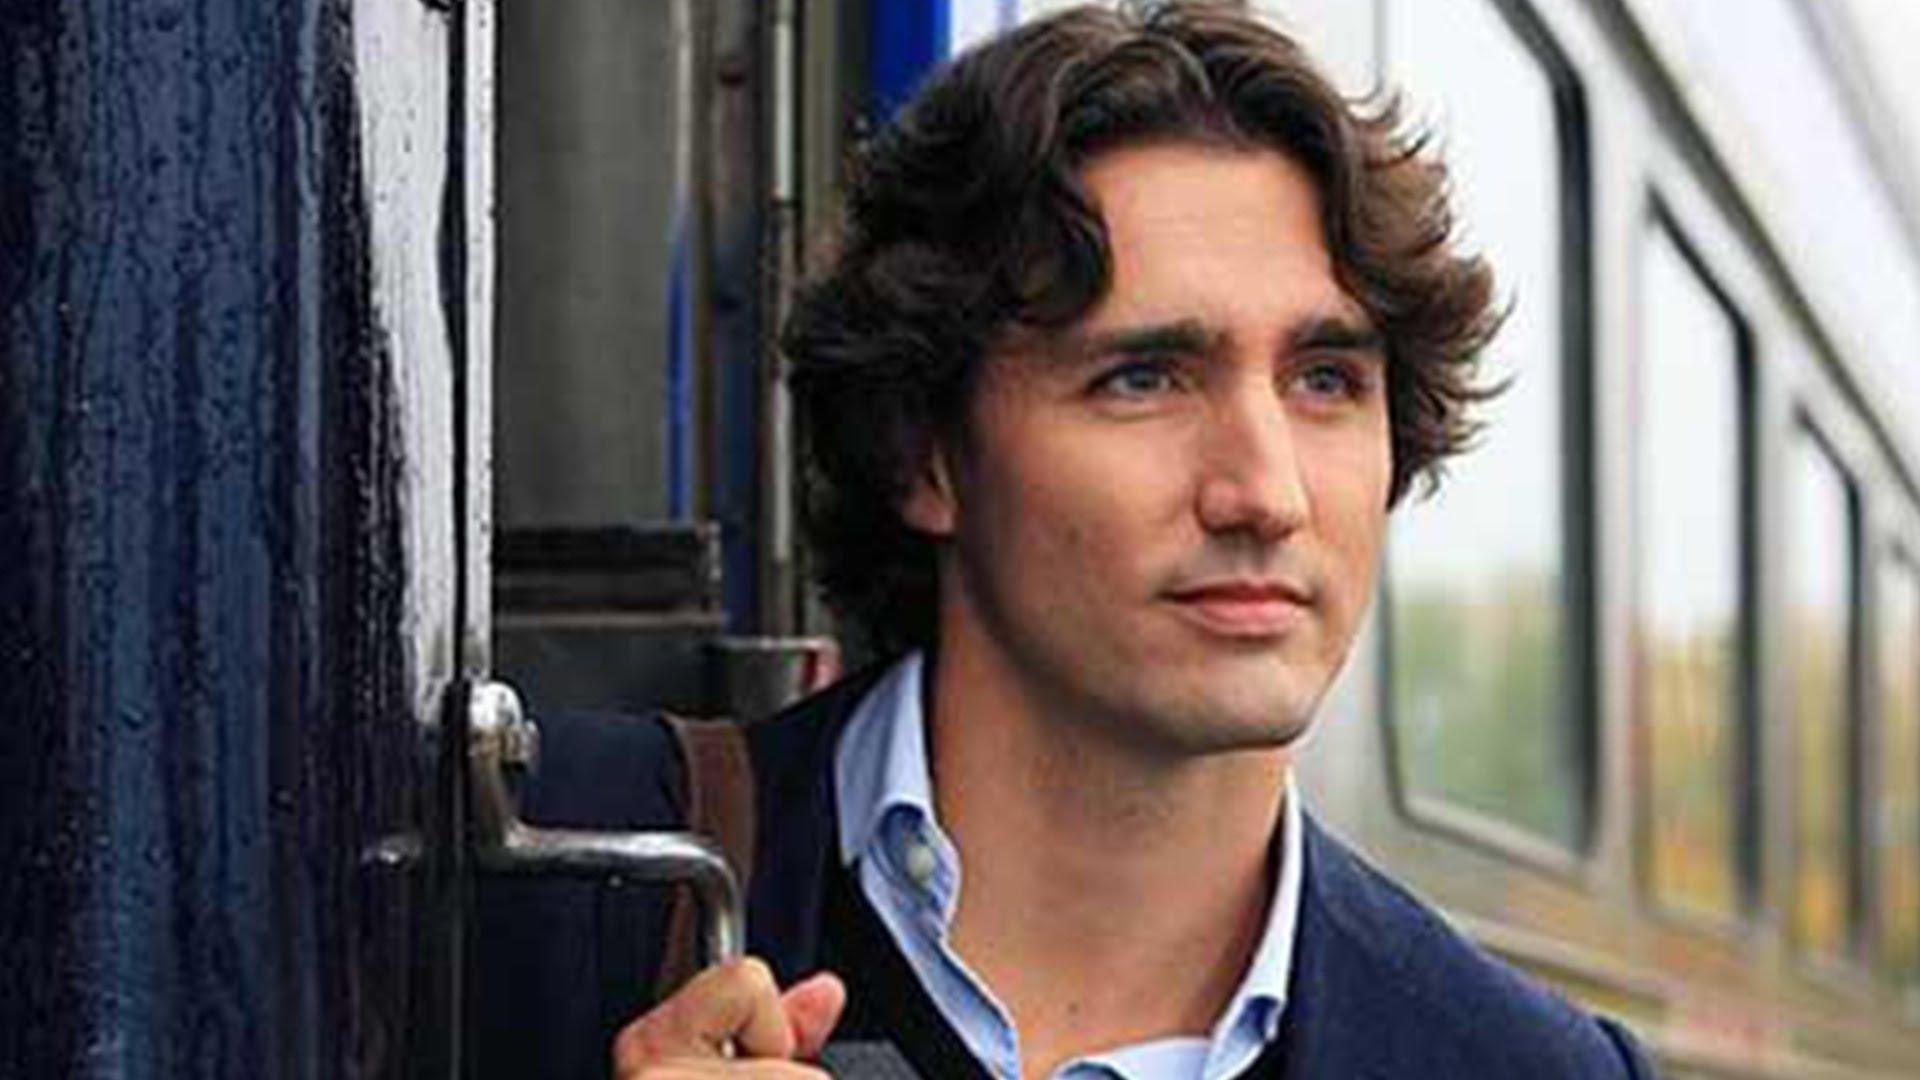 Justin Pierre James Trudeau